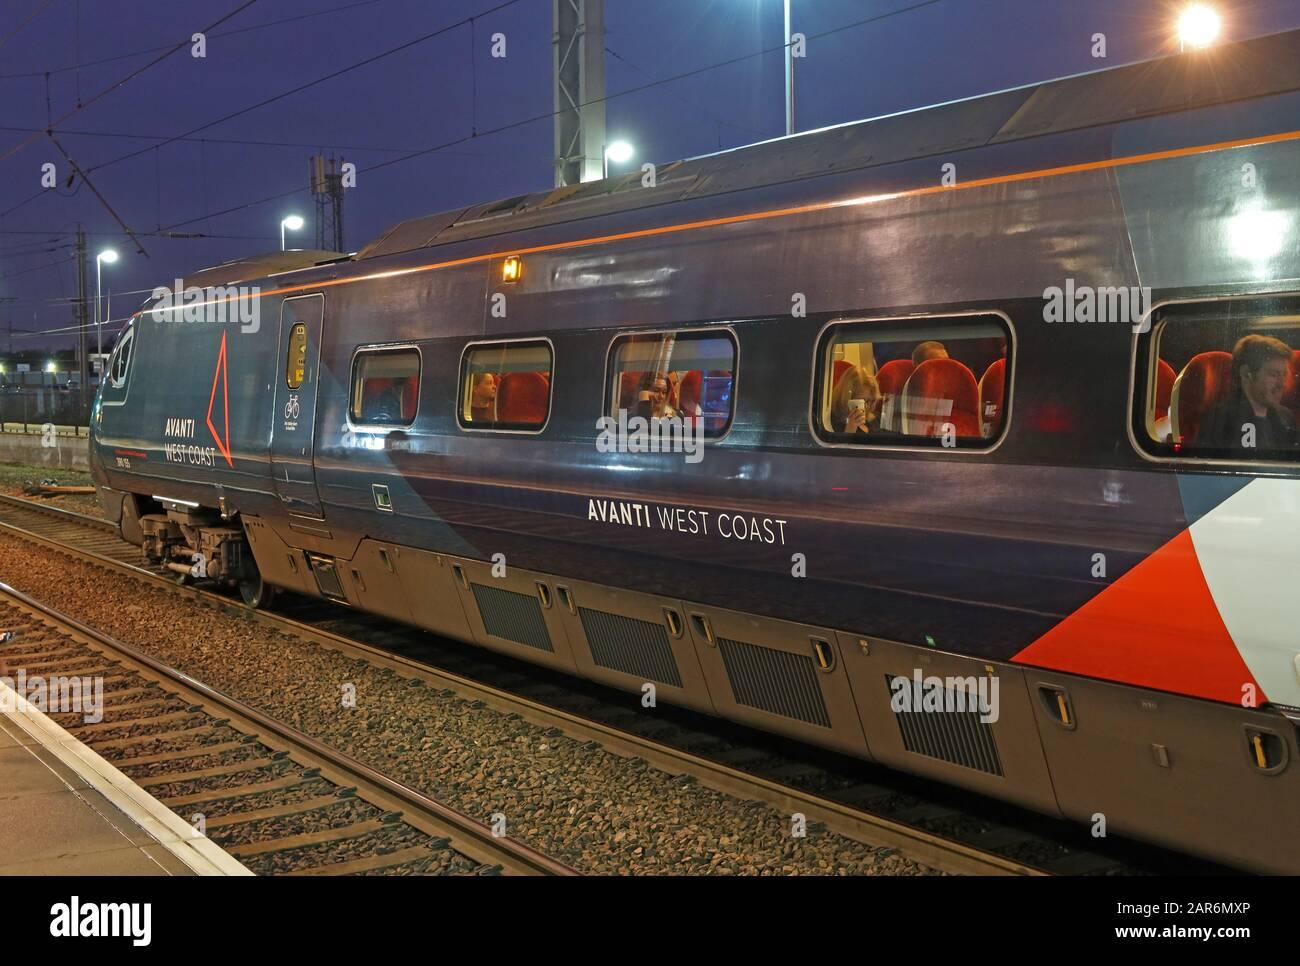 GoTonySmith,HotpixUK,@HotpixUK,railway station,electric,EMU,BR Class 390,TOC,Train Operating Company,WCML,West Coast Main Line,WA1,at night,night,dusk,Cheshire,England,Warrington,franchise,delays,late trains,poor service,good service,improvement,rebrand,rebranding,First Group,Avanti,unit,train 390155,new livery,evening,fleet,refurbished Pendolino,carriage,public transport,repainted